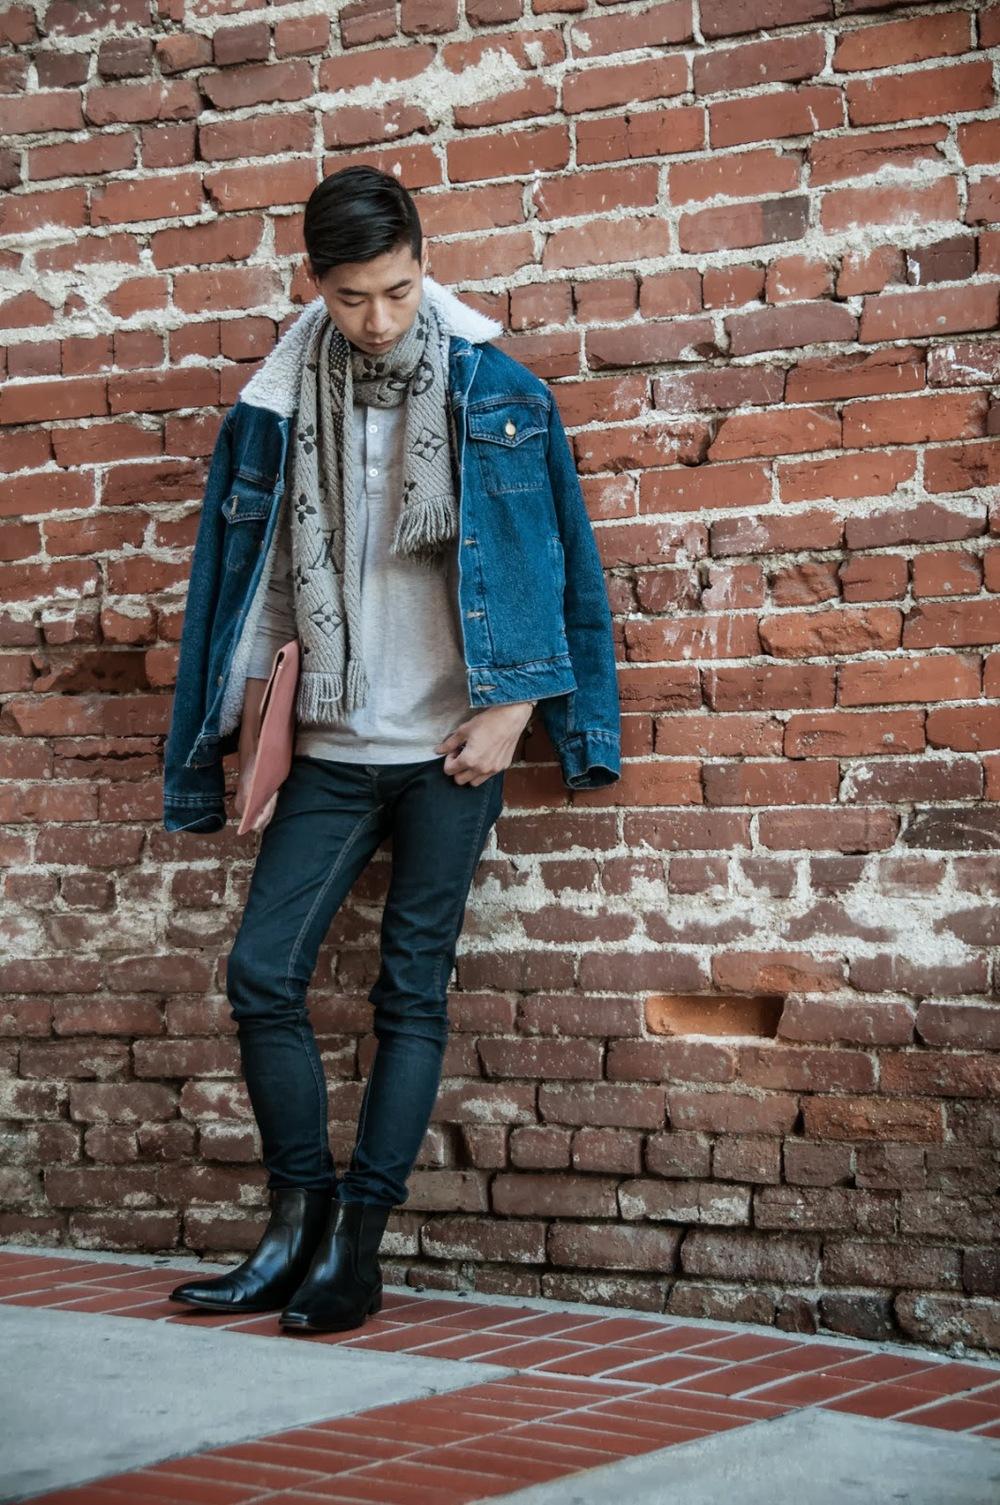 mybelonging-tommylei-giorgiobrutini-menswear-streetstyle-13.jpg